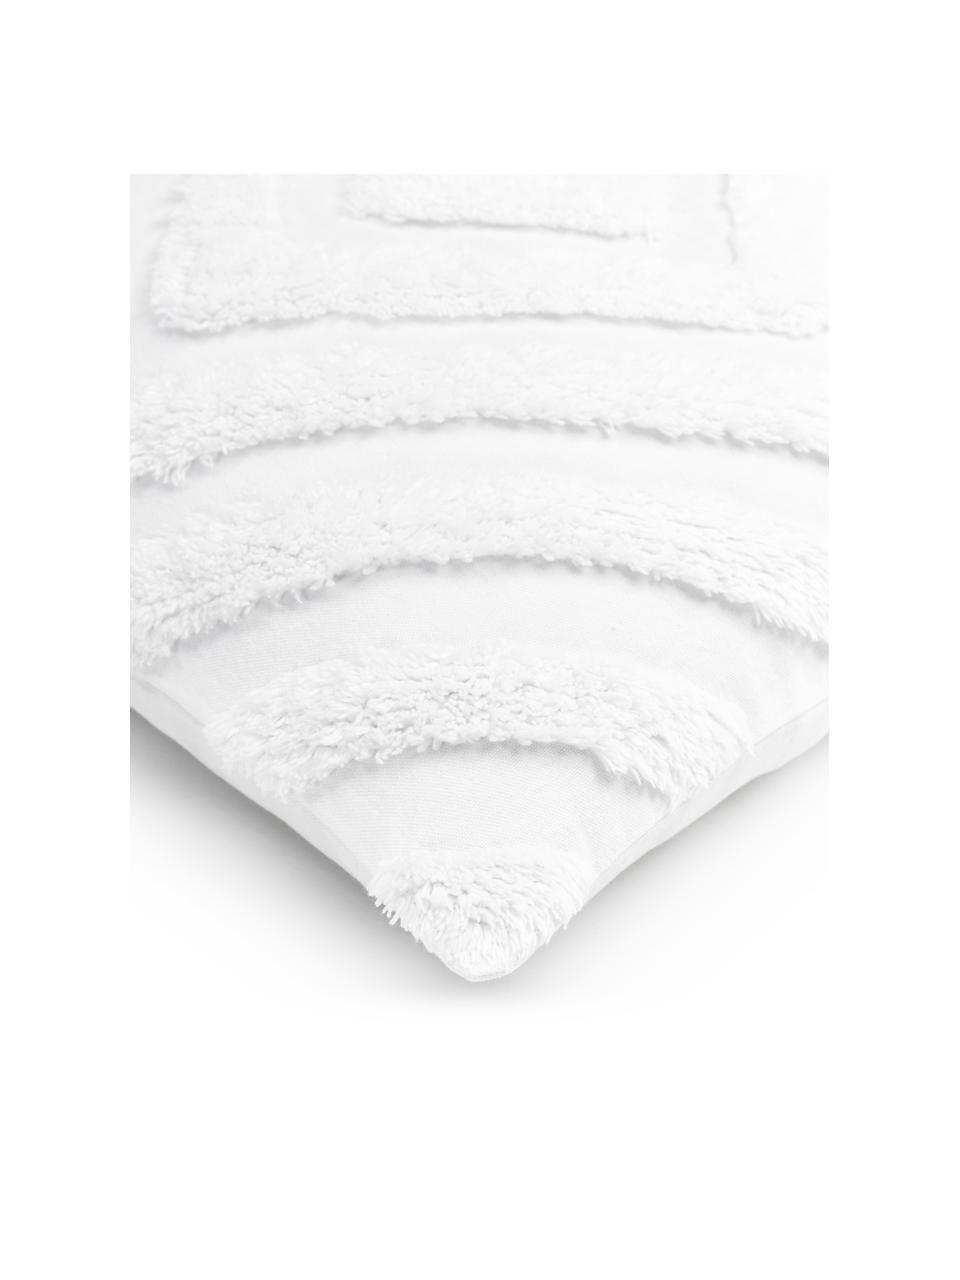 Federa arredo con motivo trapuntato Kara, 100% cotone, Bianco, Larg. 50 x Lung. 50 cm